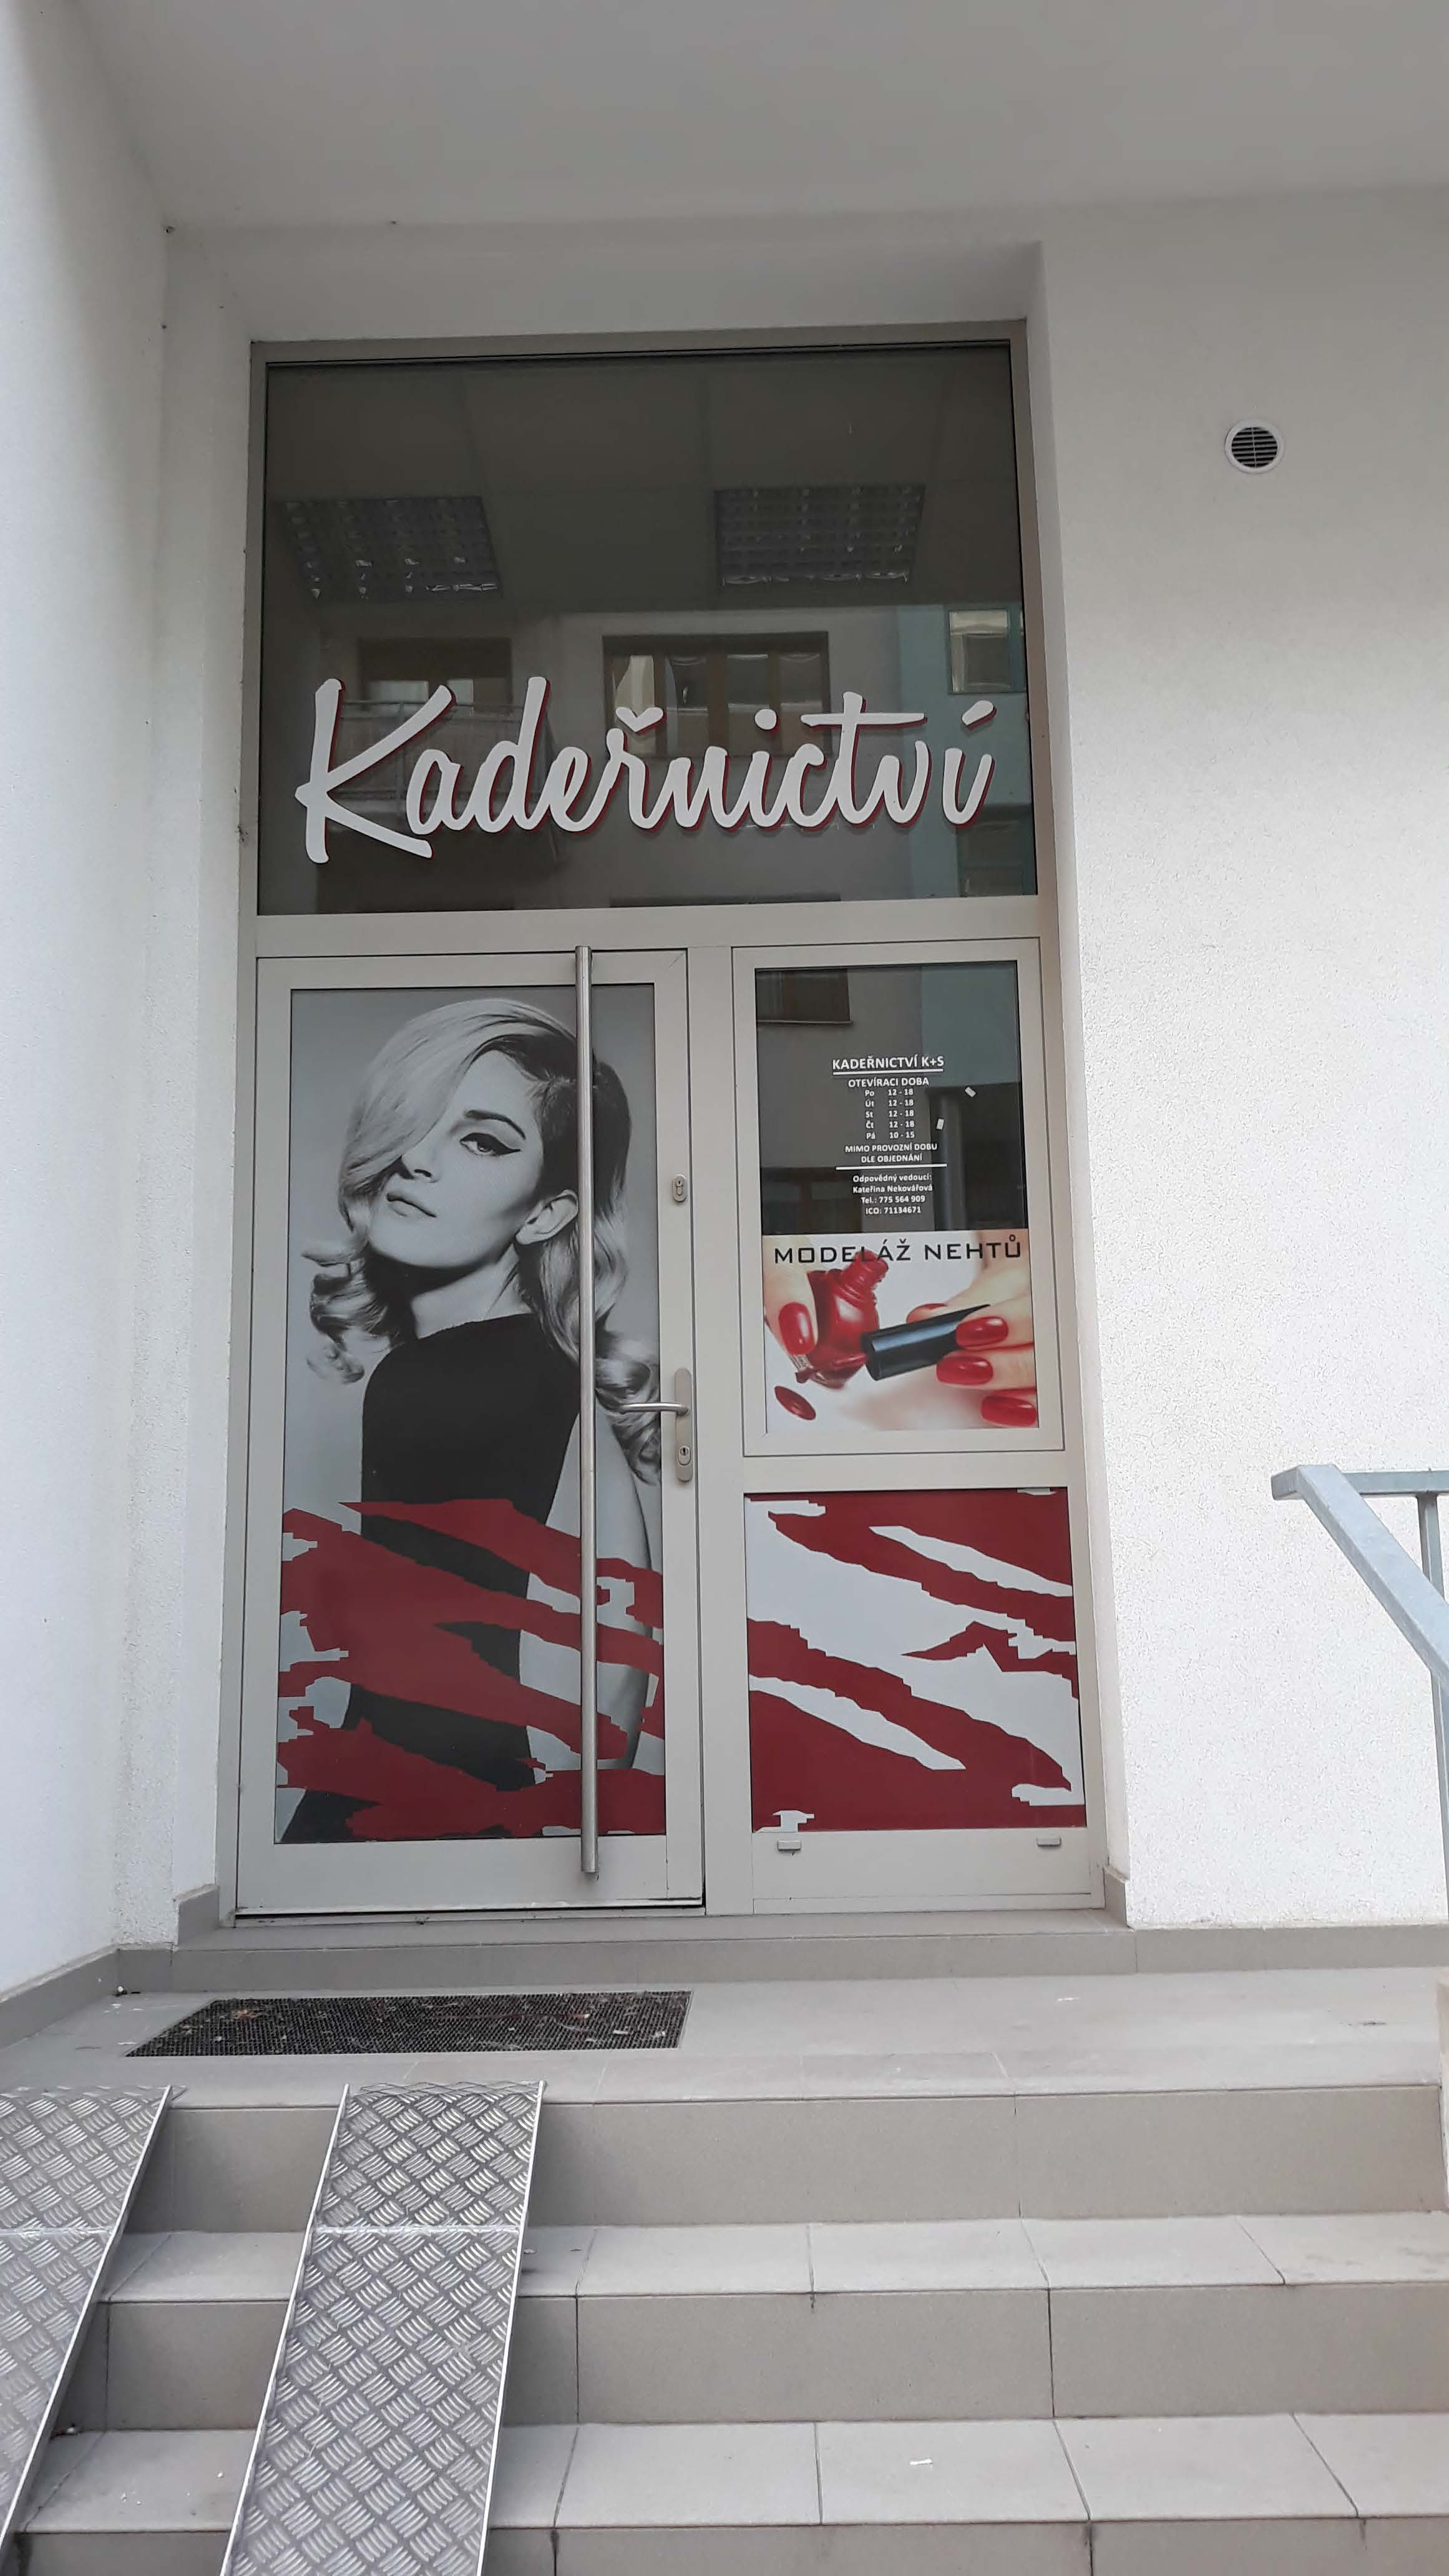 Obchodní prostory na pronájem, Praha 3 (Žižkov)